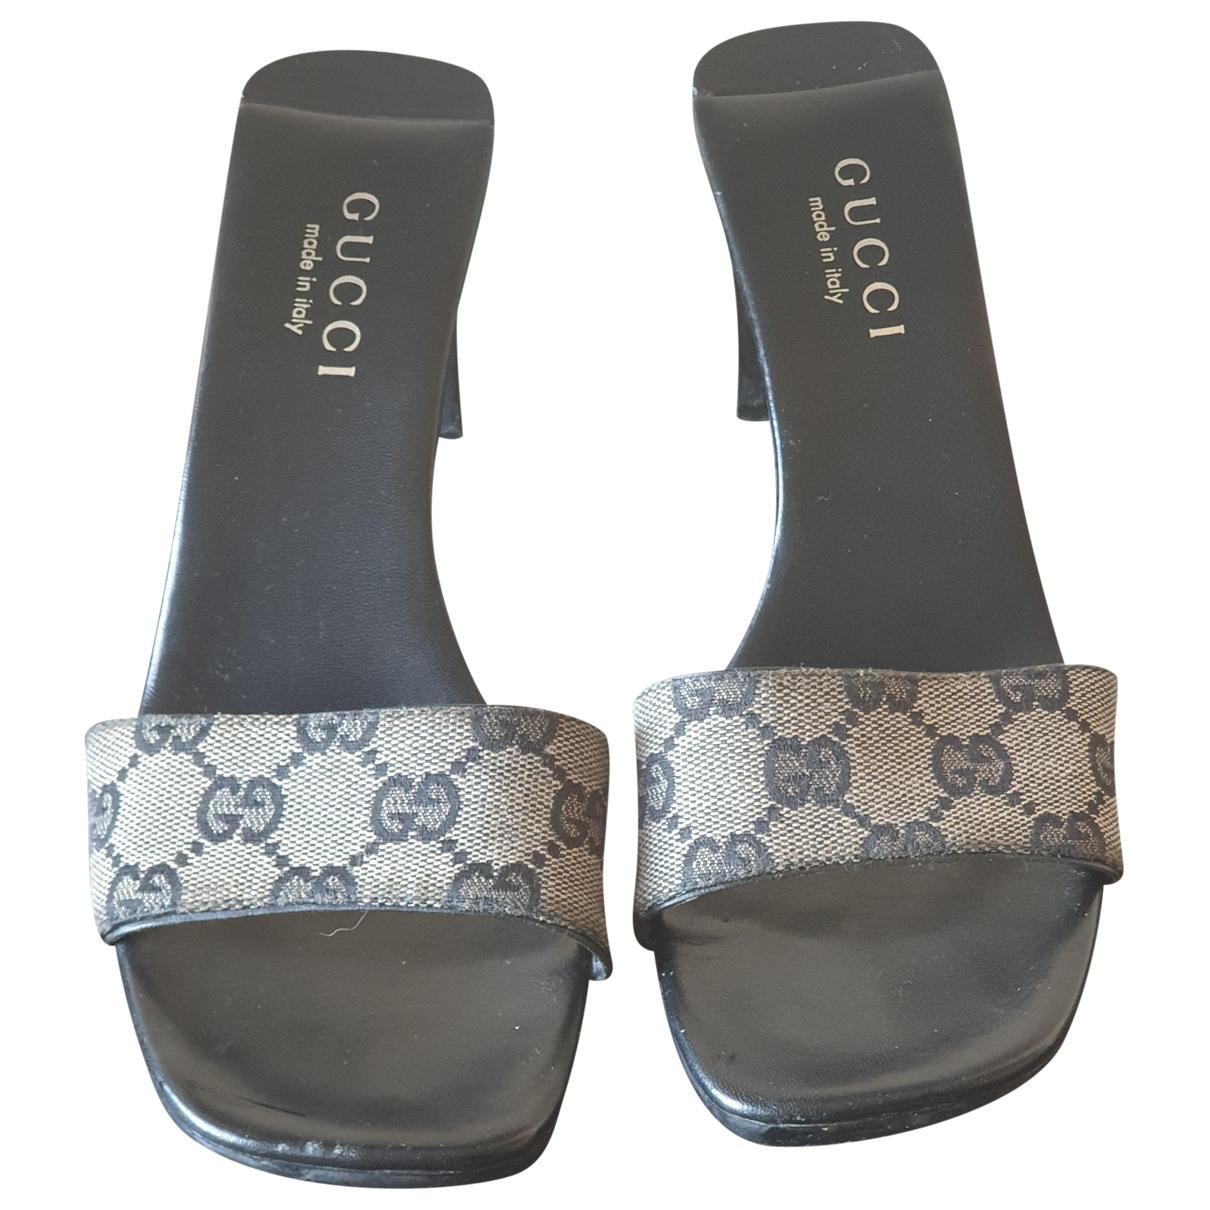 Zuecos Double G de Lona Gucci